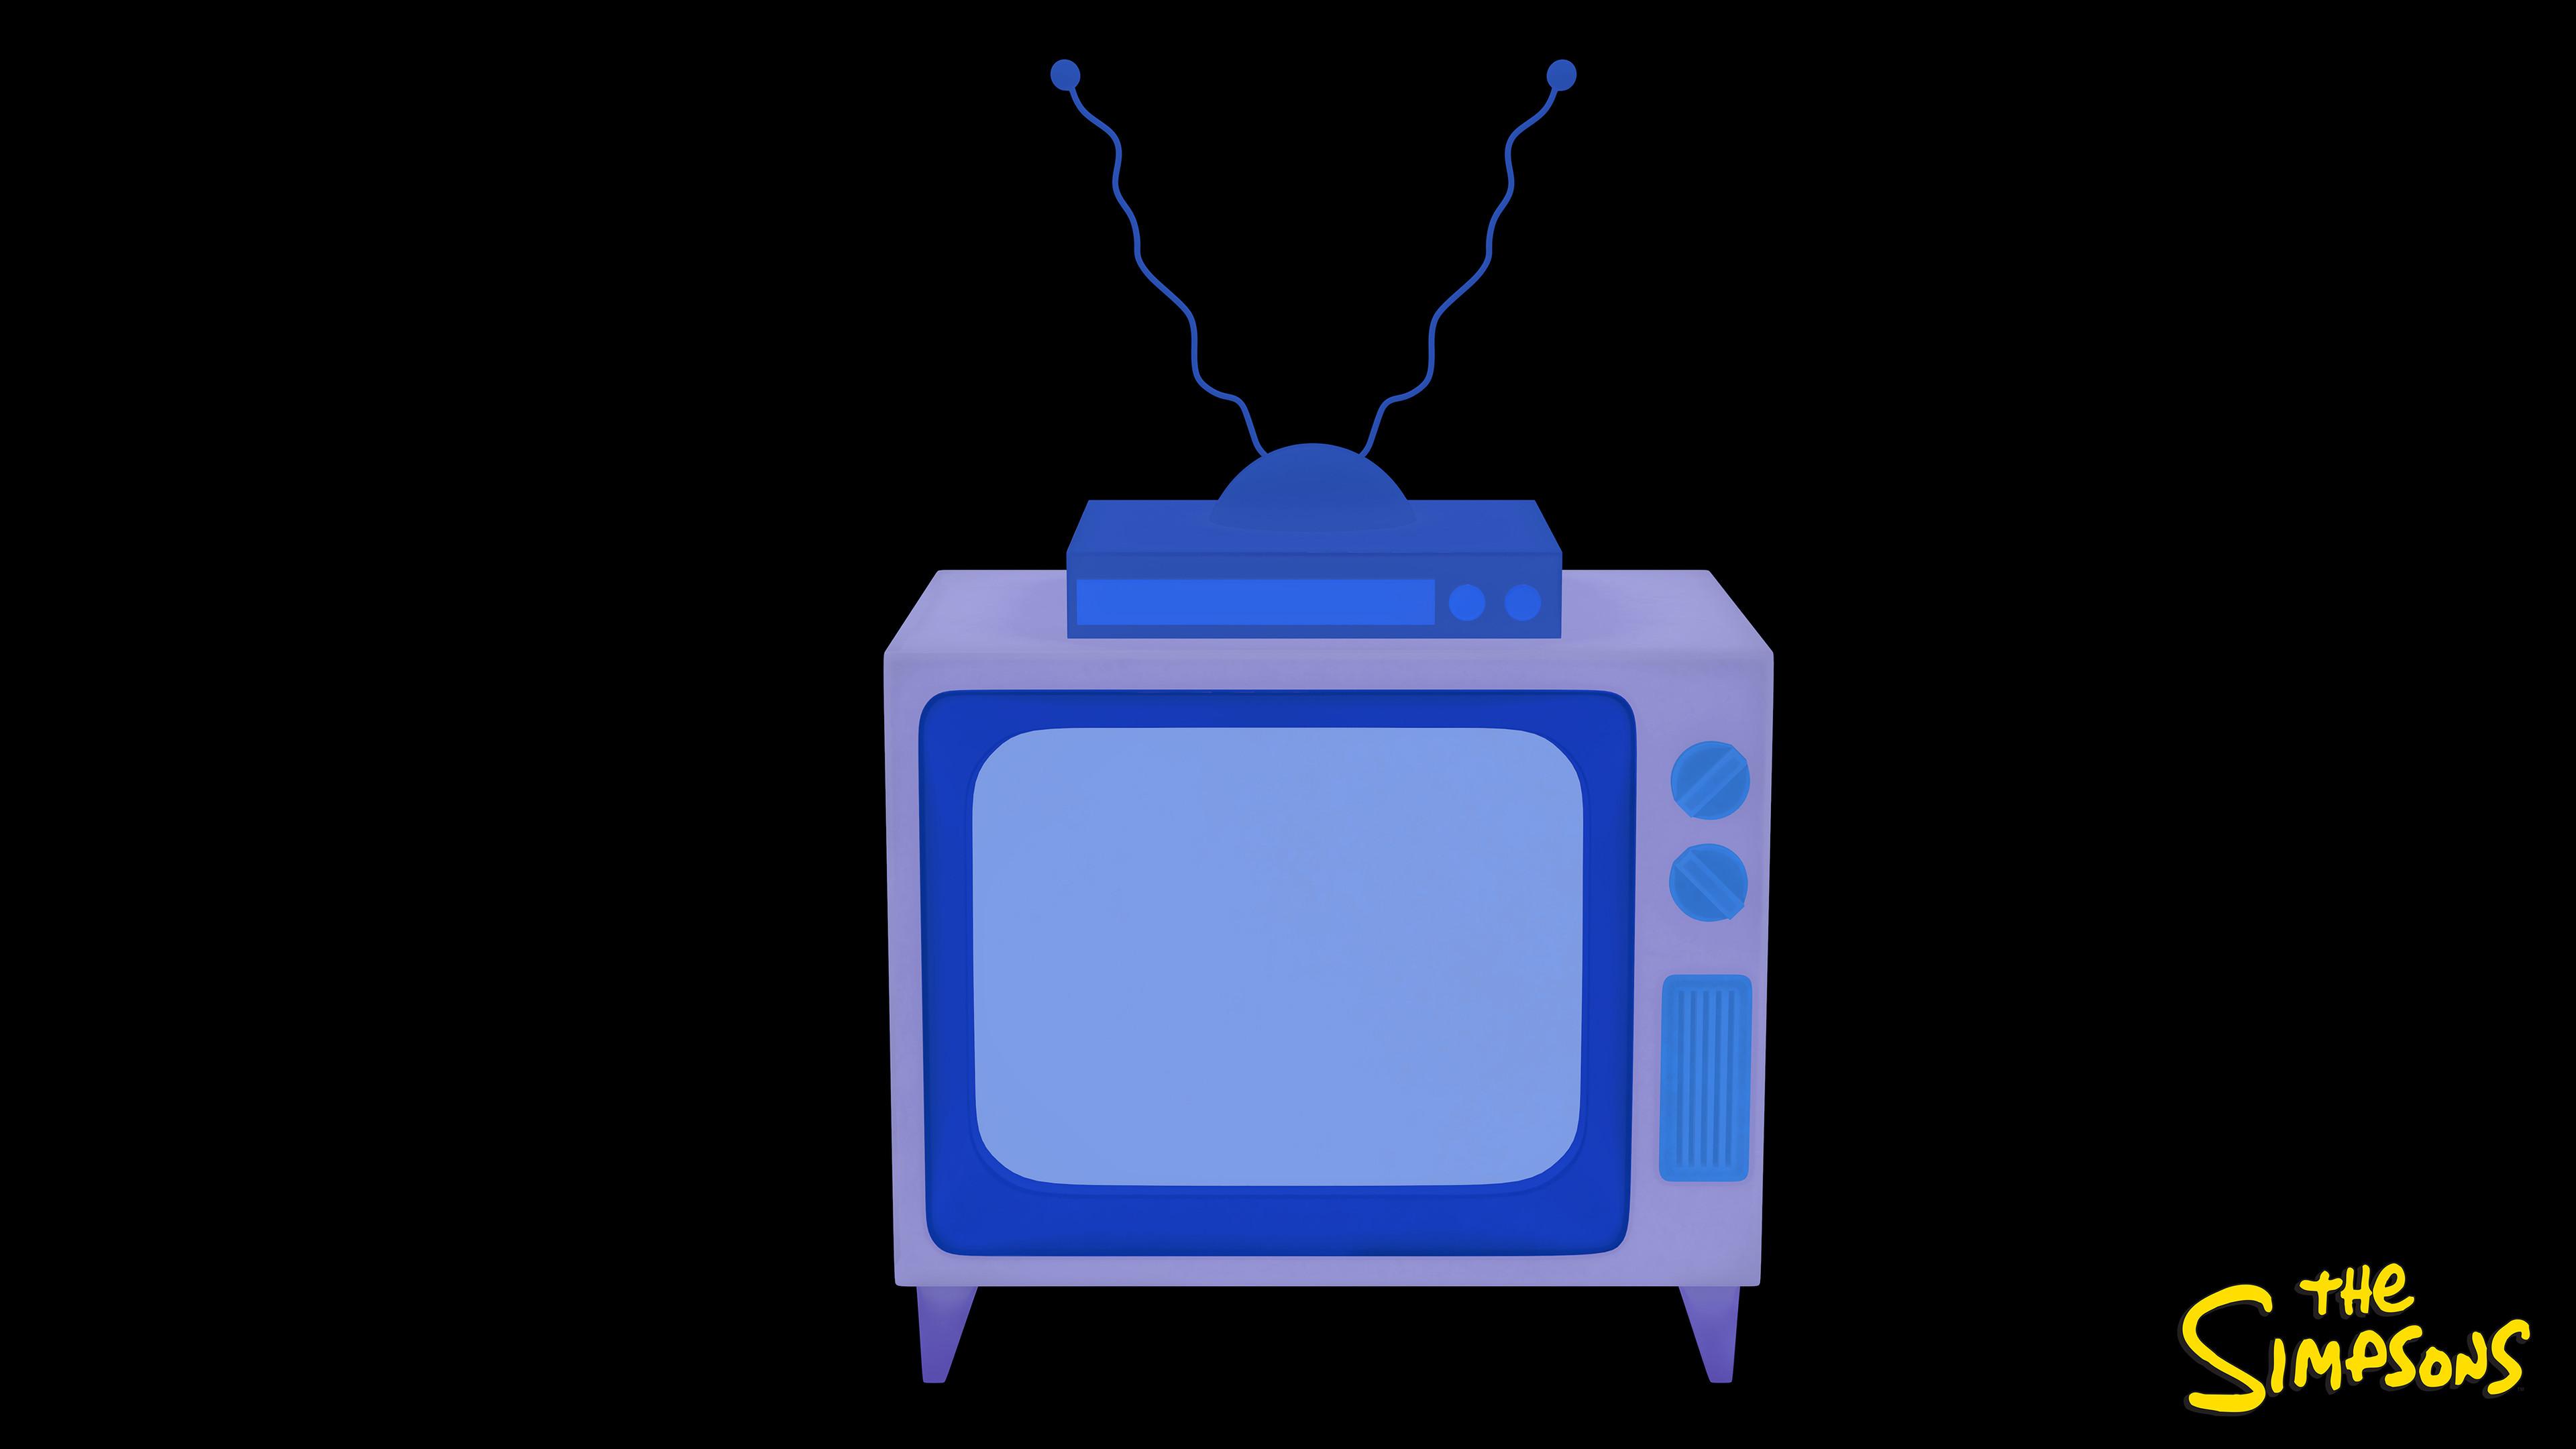 Television Set Albedo